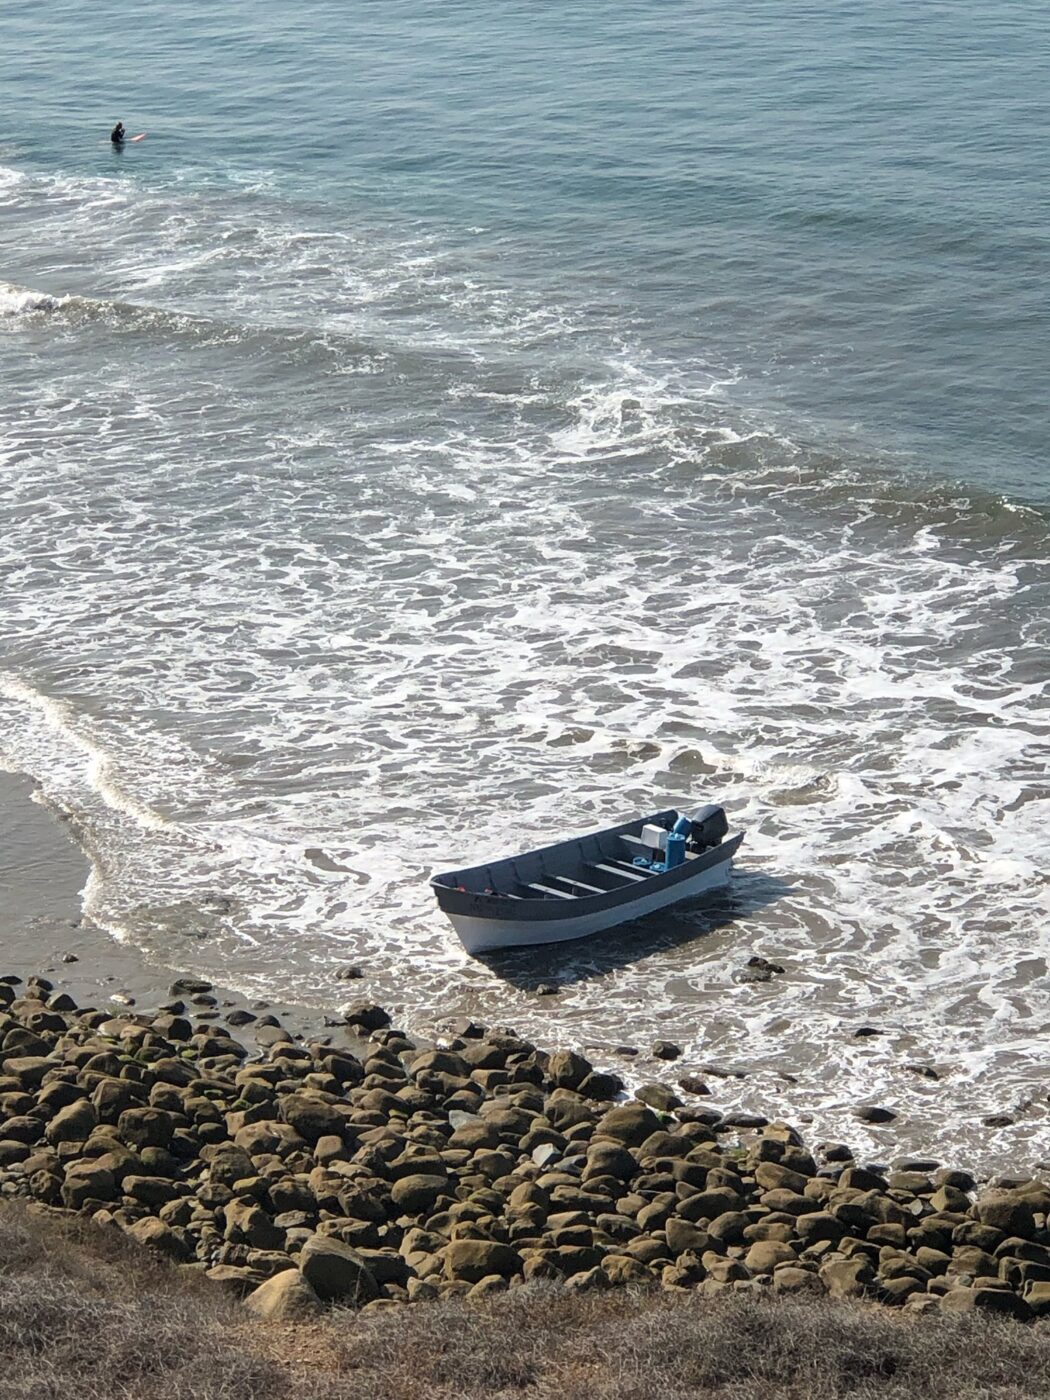 California State Park Ranger Spurs Rescue After Spotting Passenger-filled Panga Boat